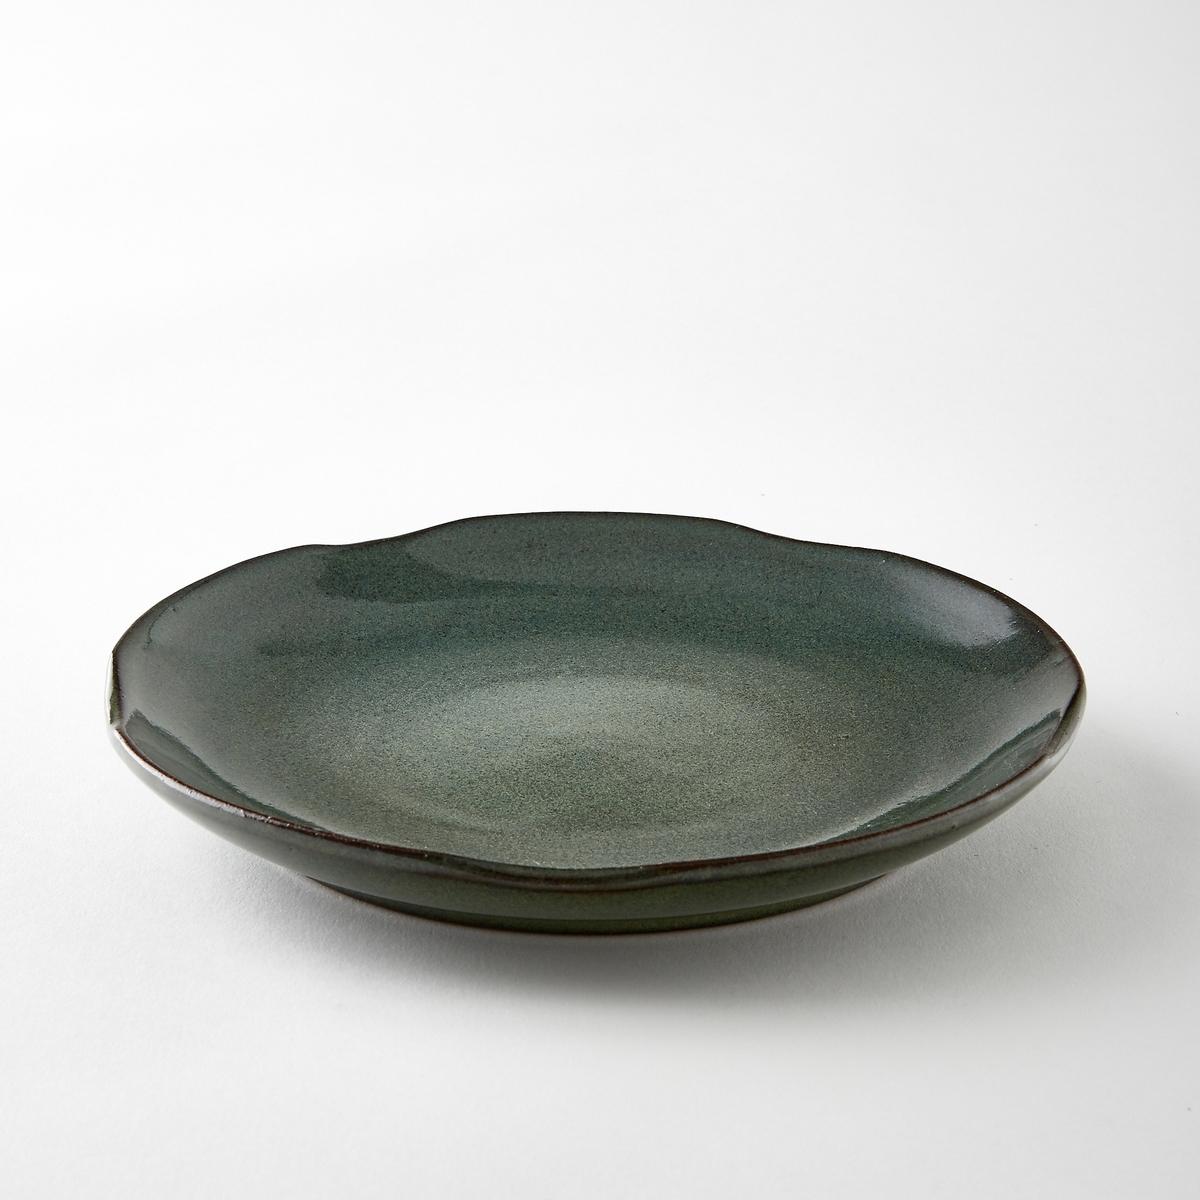 Тарелка десертная из керамики, диаметр 22 см, Aqua от Serax 1600 714 тарелка десертная волшебство d 22 см